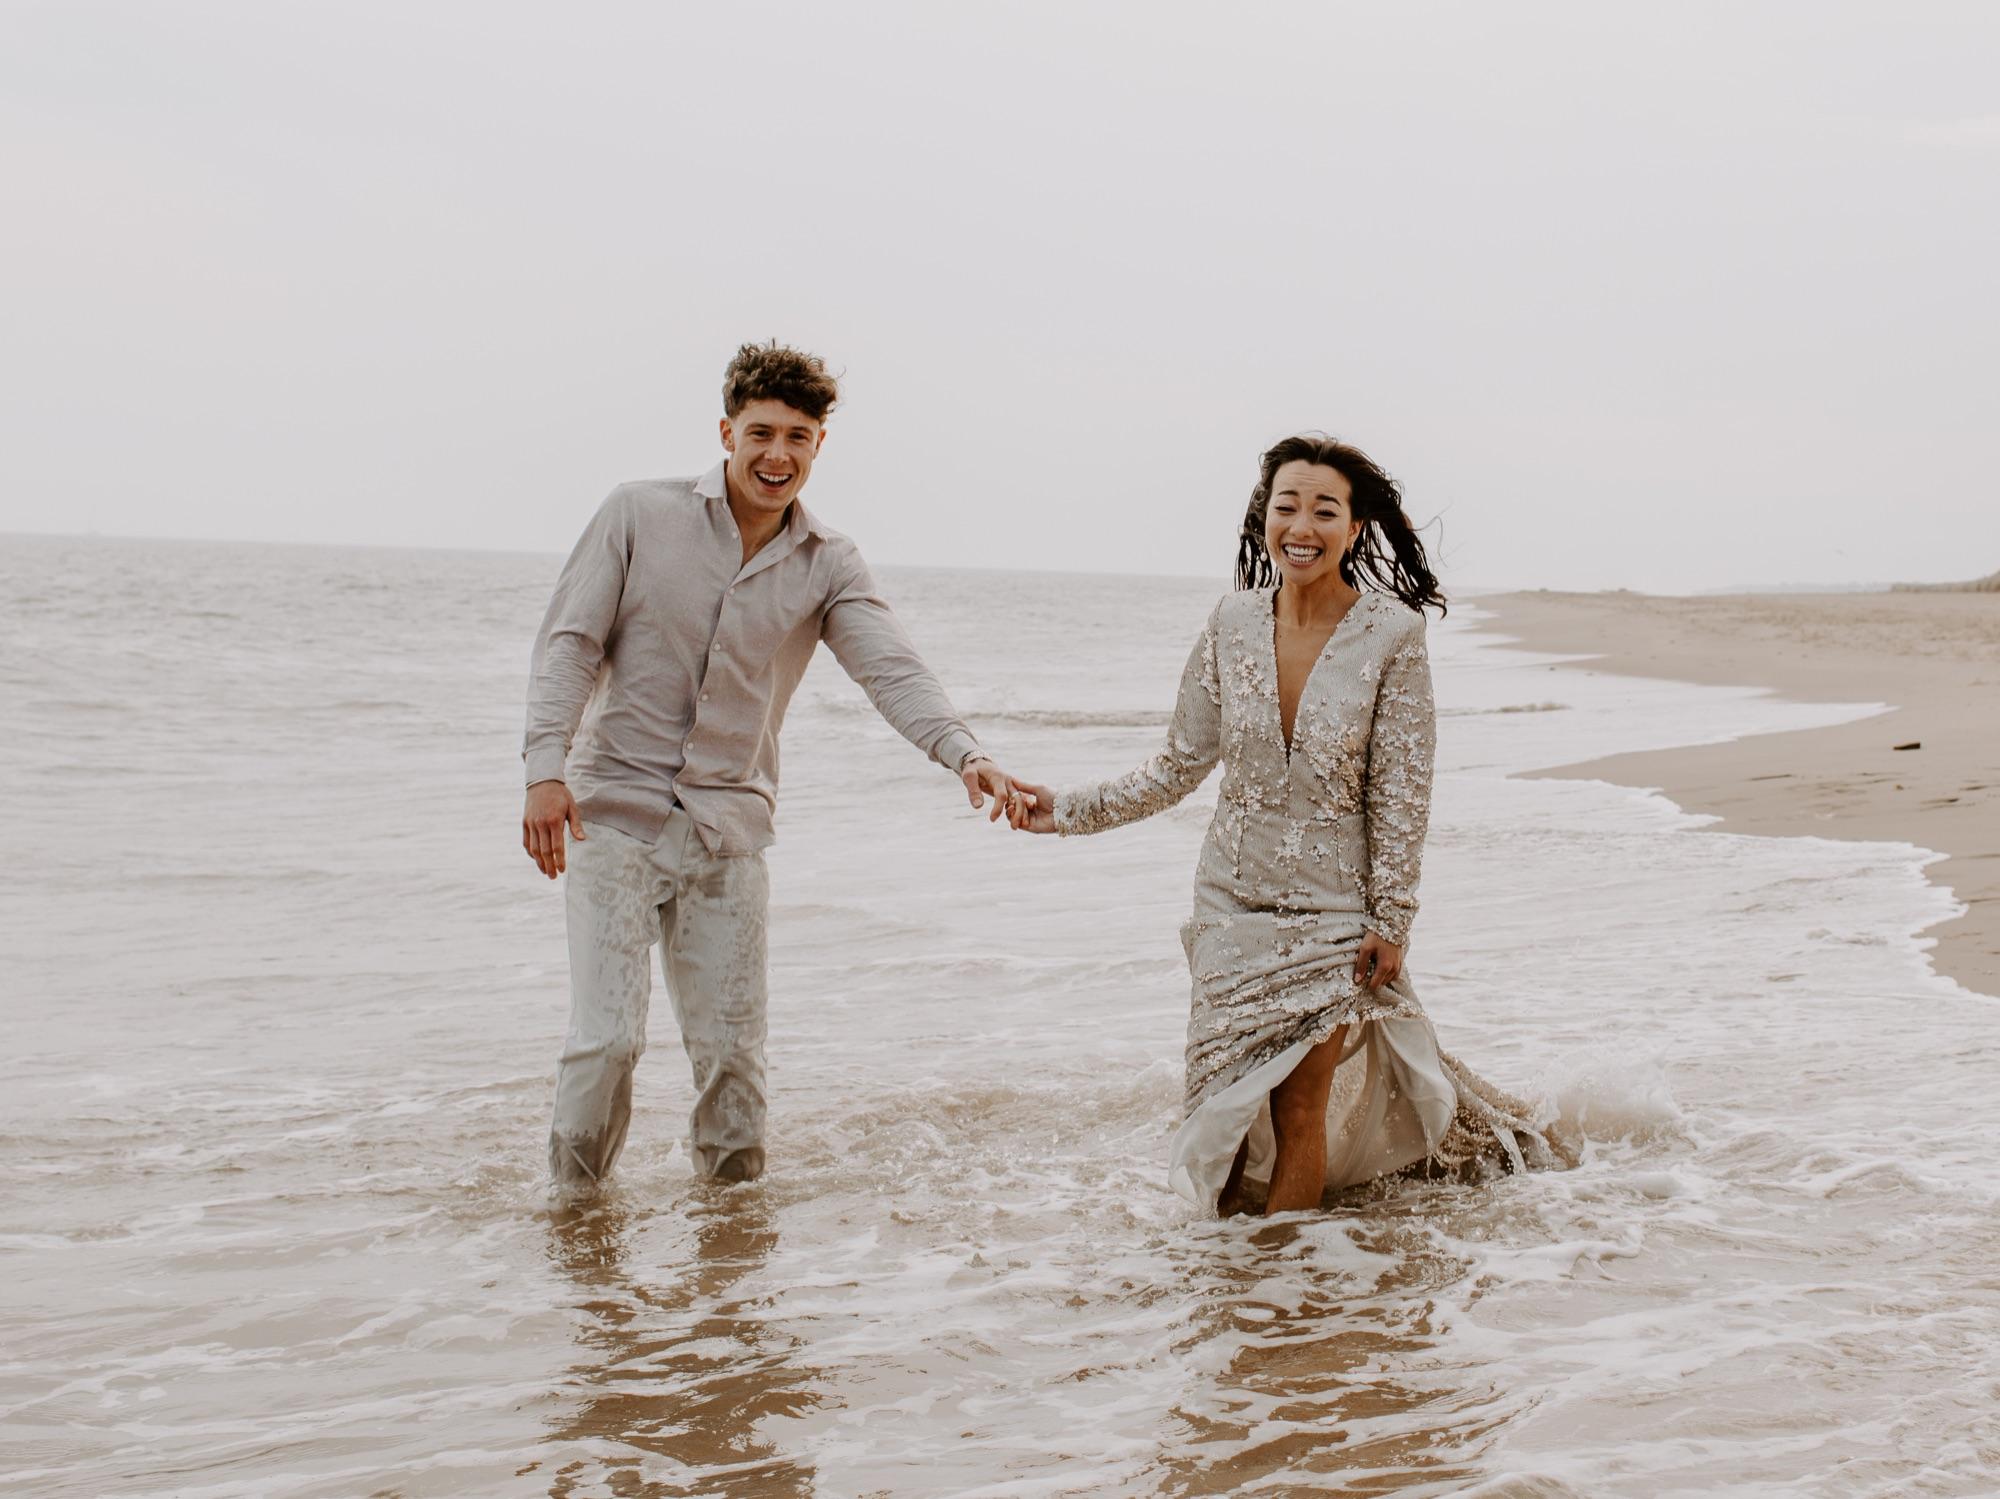 Wedding_Photography-26.jpg